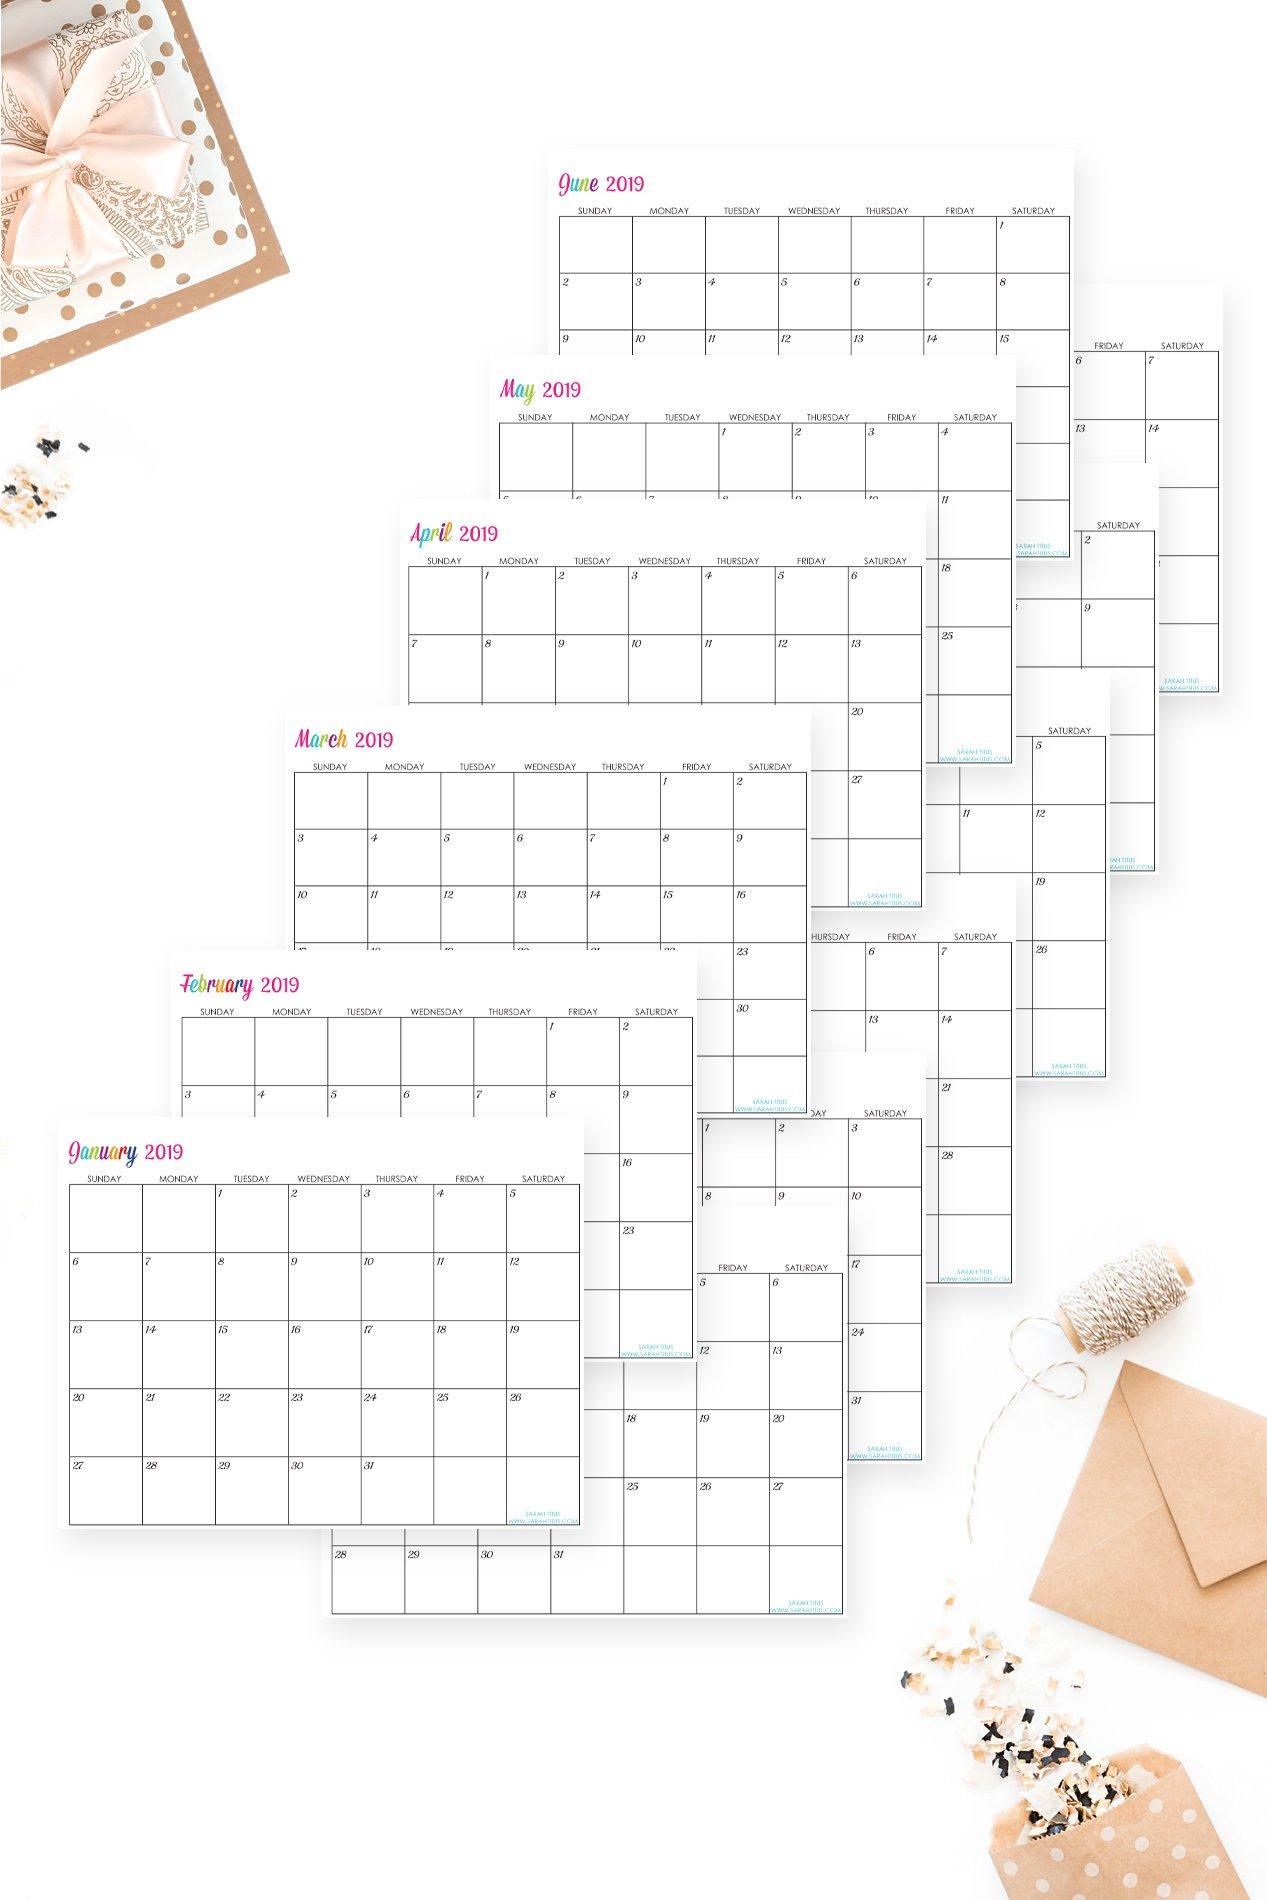 Custom Editable Free Printable 2019 Calendars – Sarah Titus Free Calendars That I Can Edit And Print